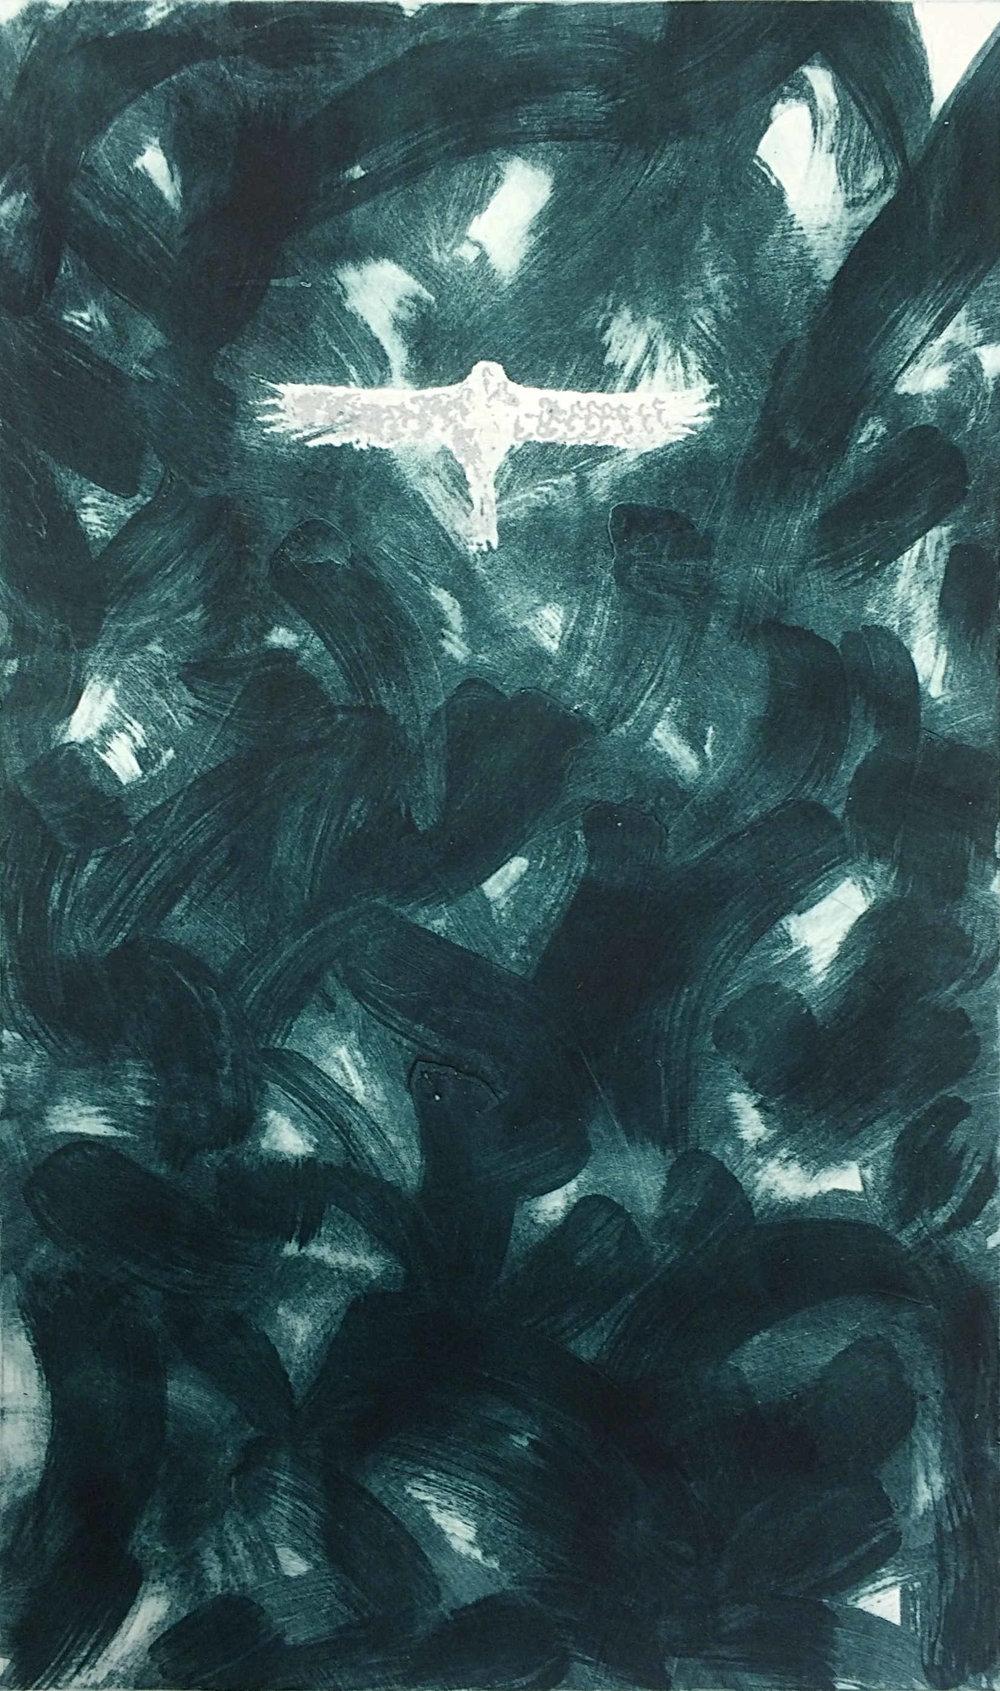 Anne Madden,  Carborundum, 62 x 104 cm image size, 79 x 128 cm sheet size, €2,500.00 framed